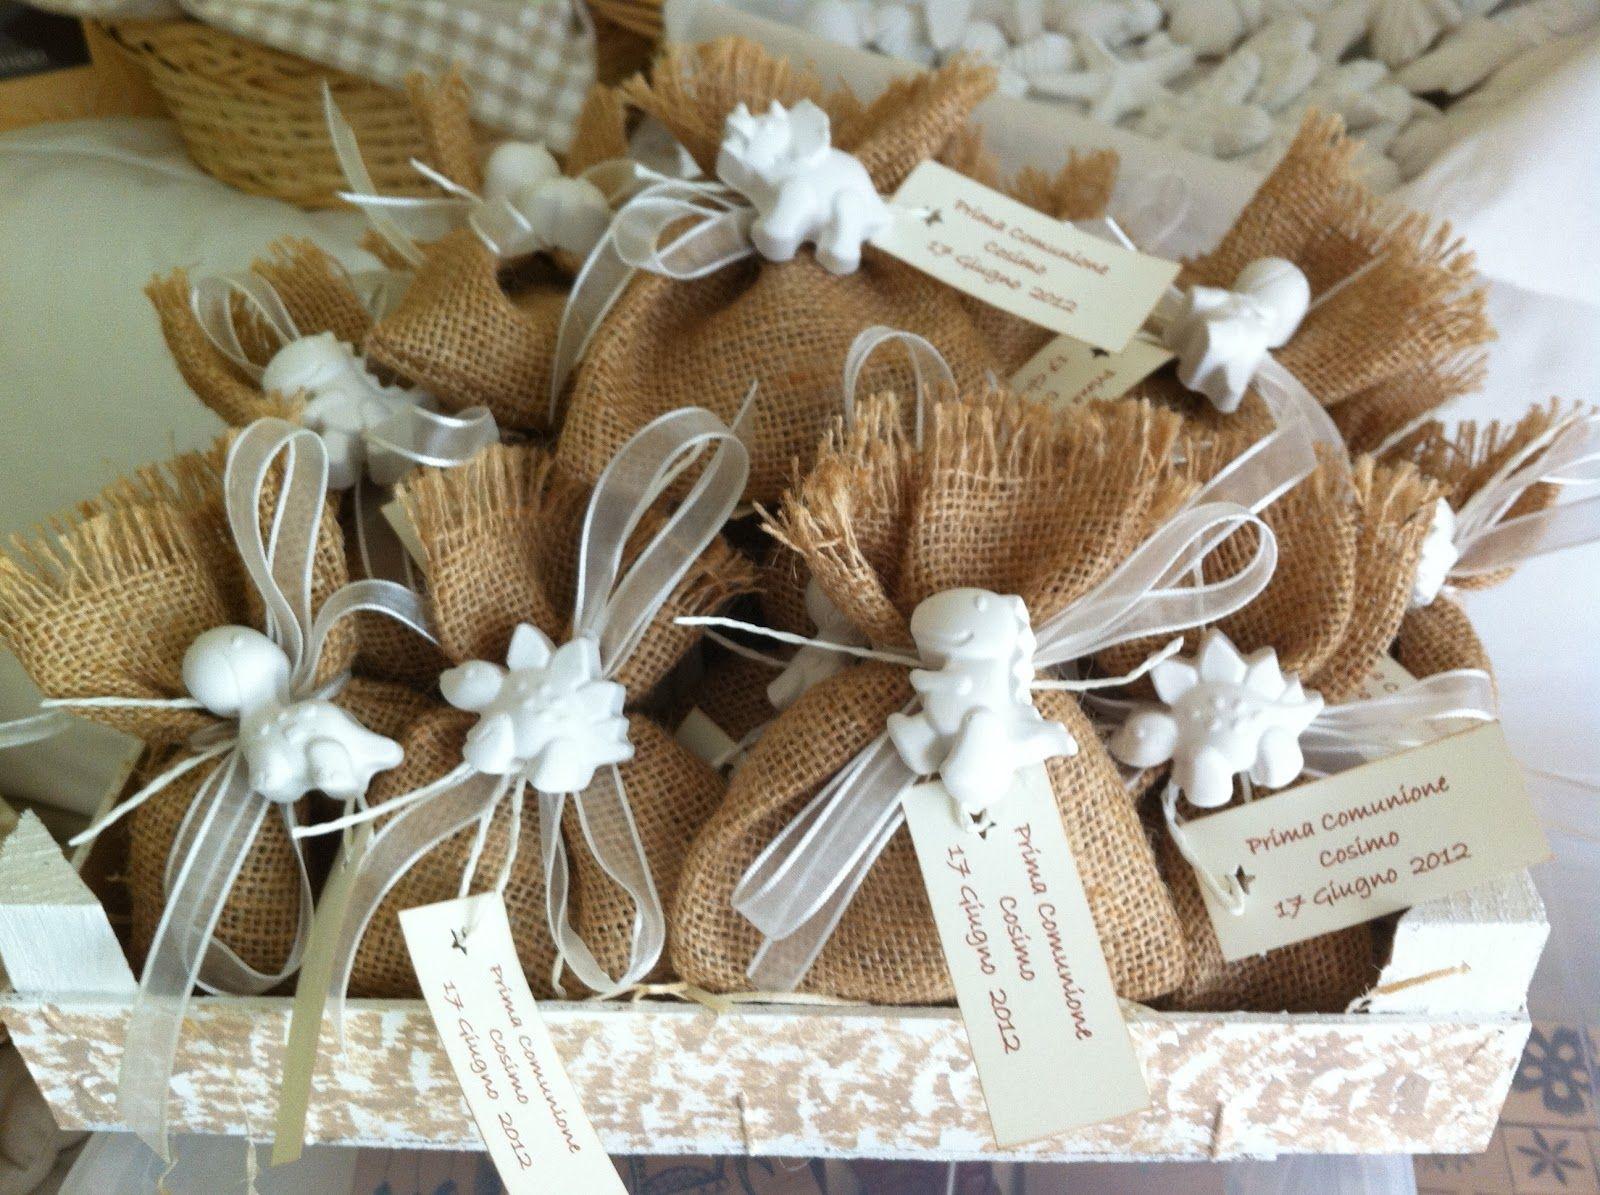 sacchetti juta e gessetti bomboniere bomboniere pinterest favors christening and confetti. Black Bedroom Furniture Sets. Home Design Ideas